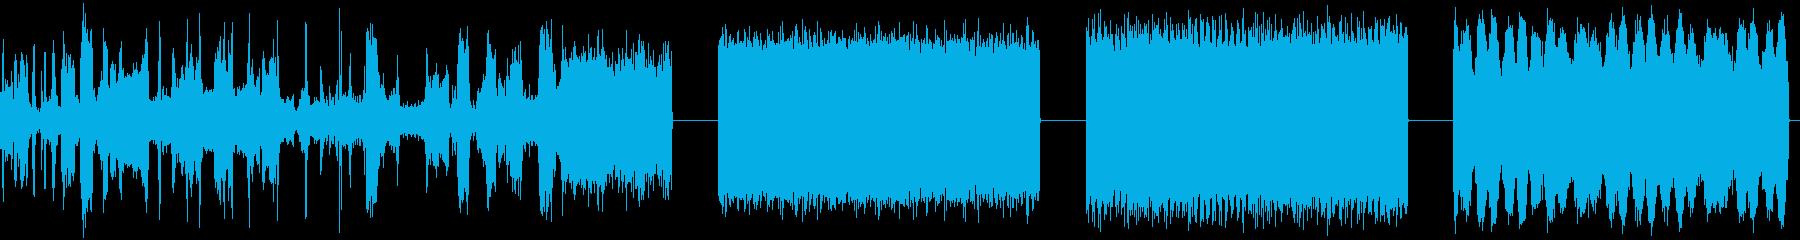 AM RADIO、SCAN、NOI...の再生済みの波形